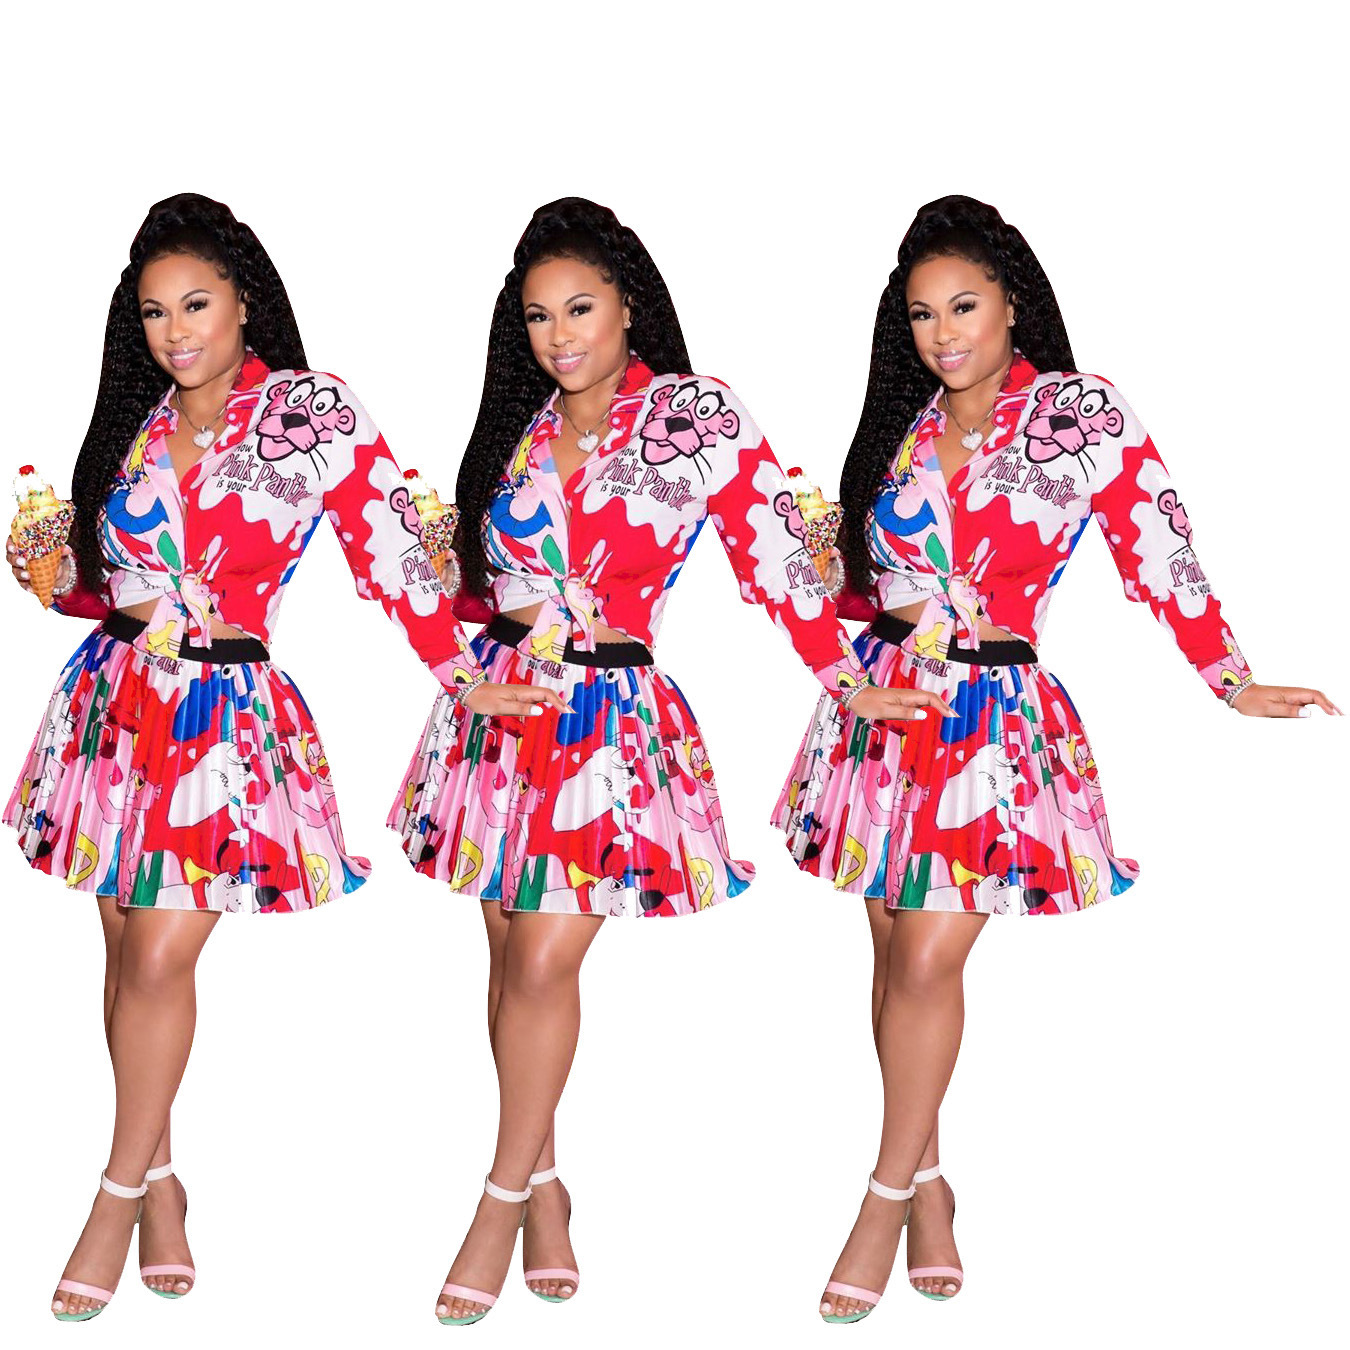 D9155 AliExpress Hot Selling Europe And America WOMEN'S Dress Cartoon Printed Short Skirt Tops Set